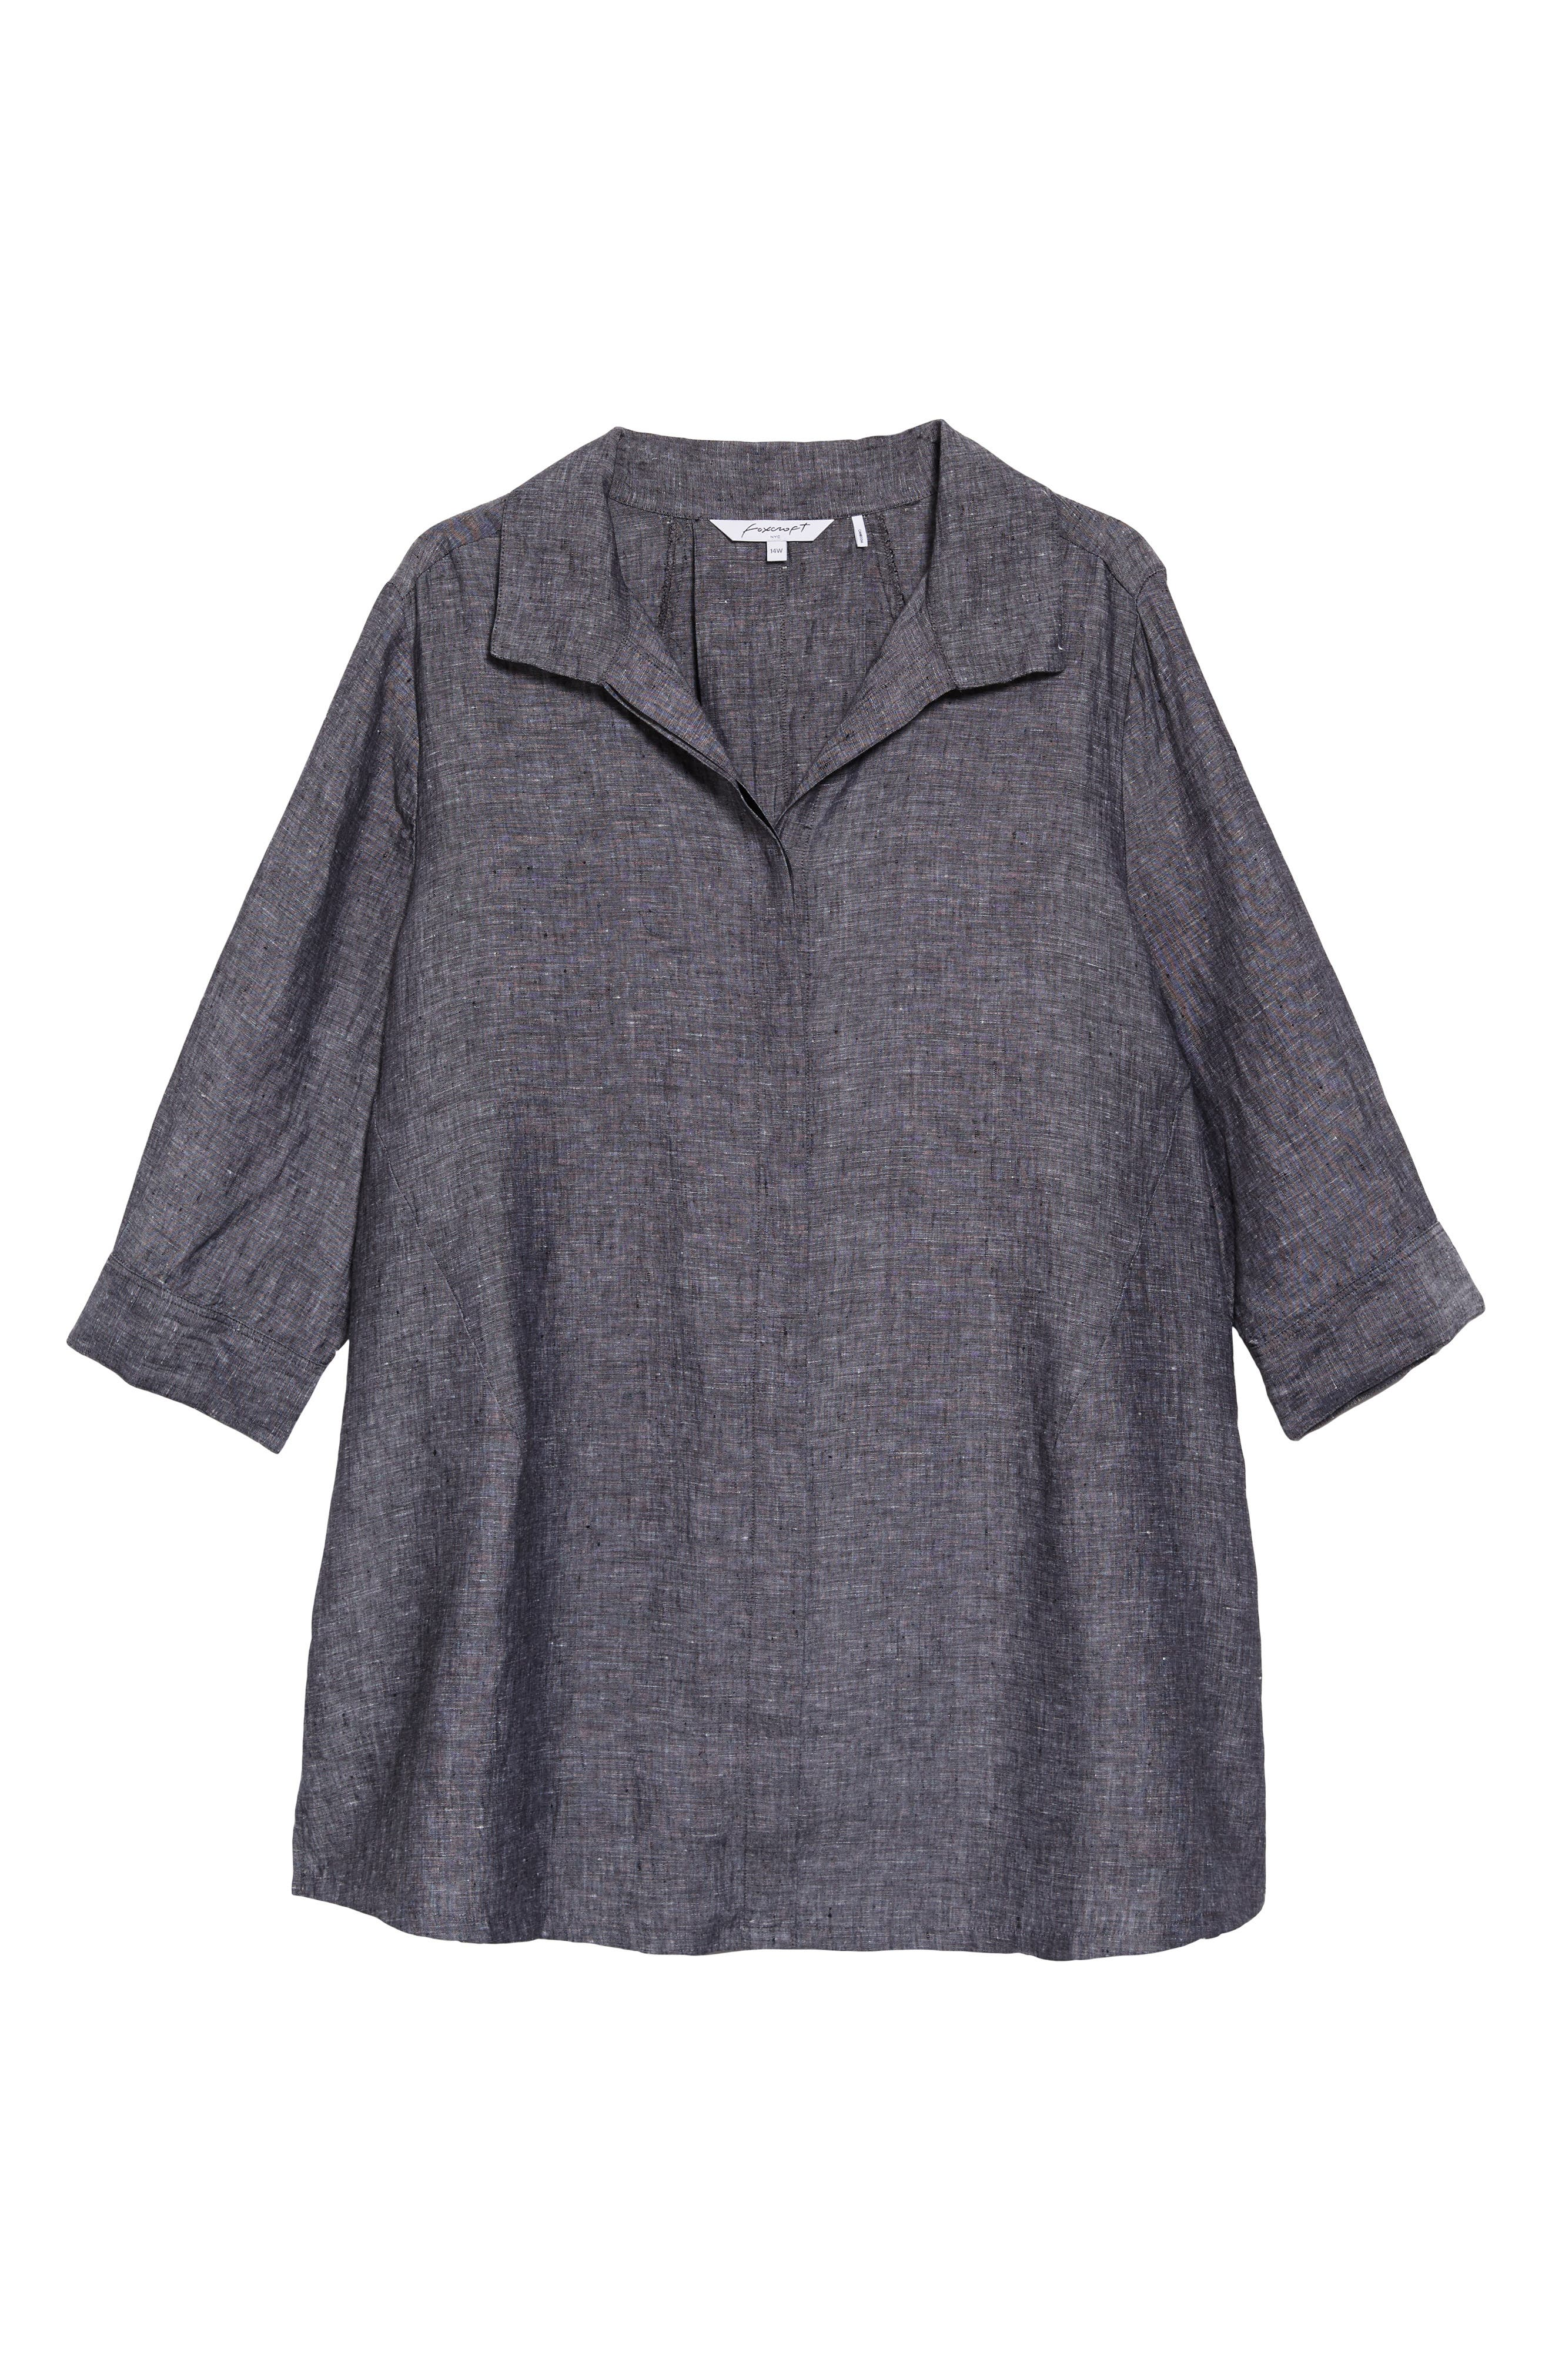 FOXCROFT, Chambray Linen Tunic Shirt, Alternate thumbnail 6, color, BLACK